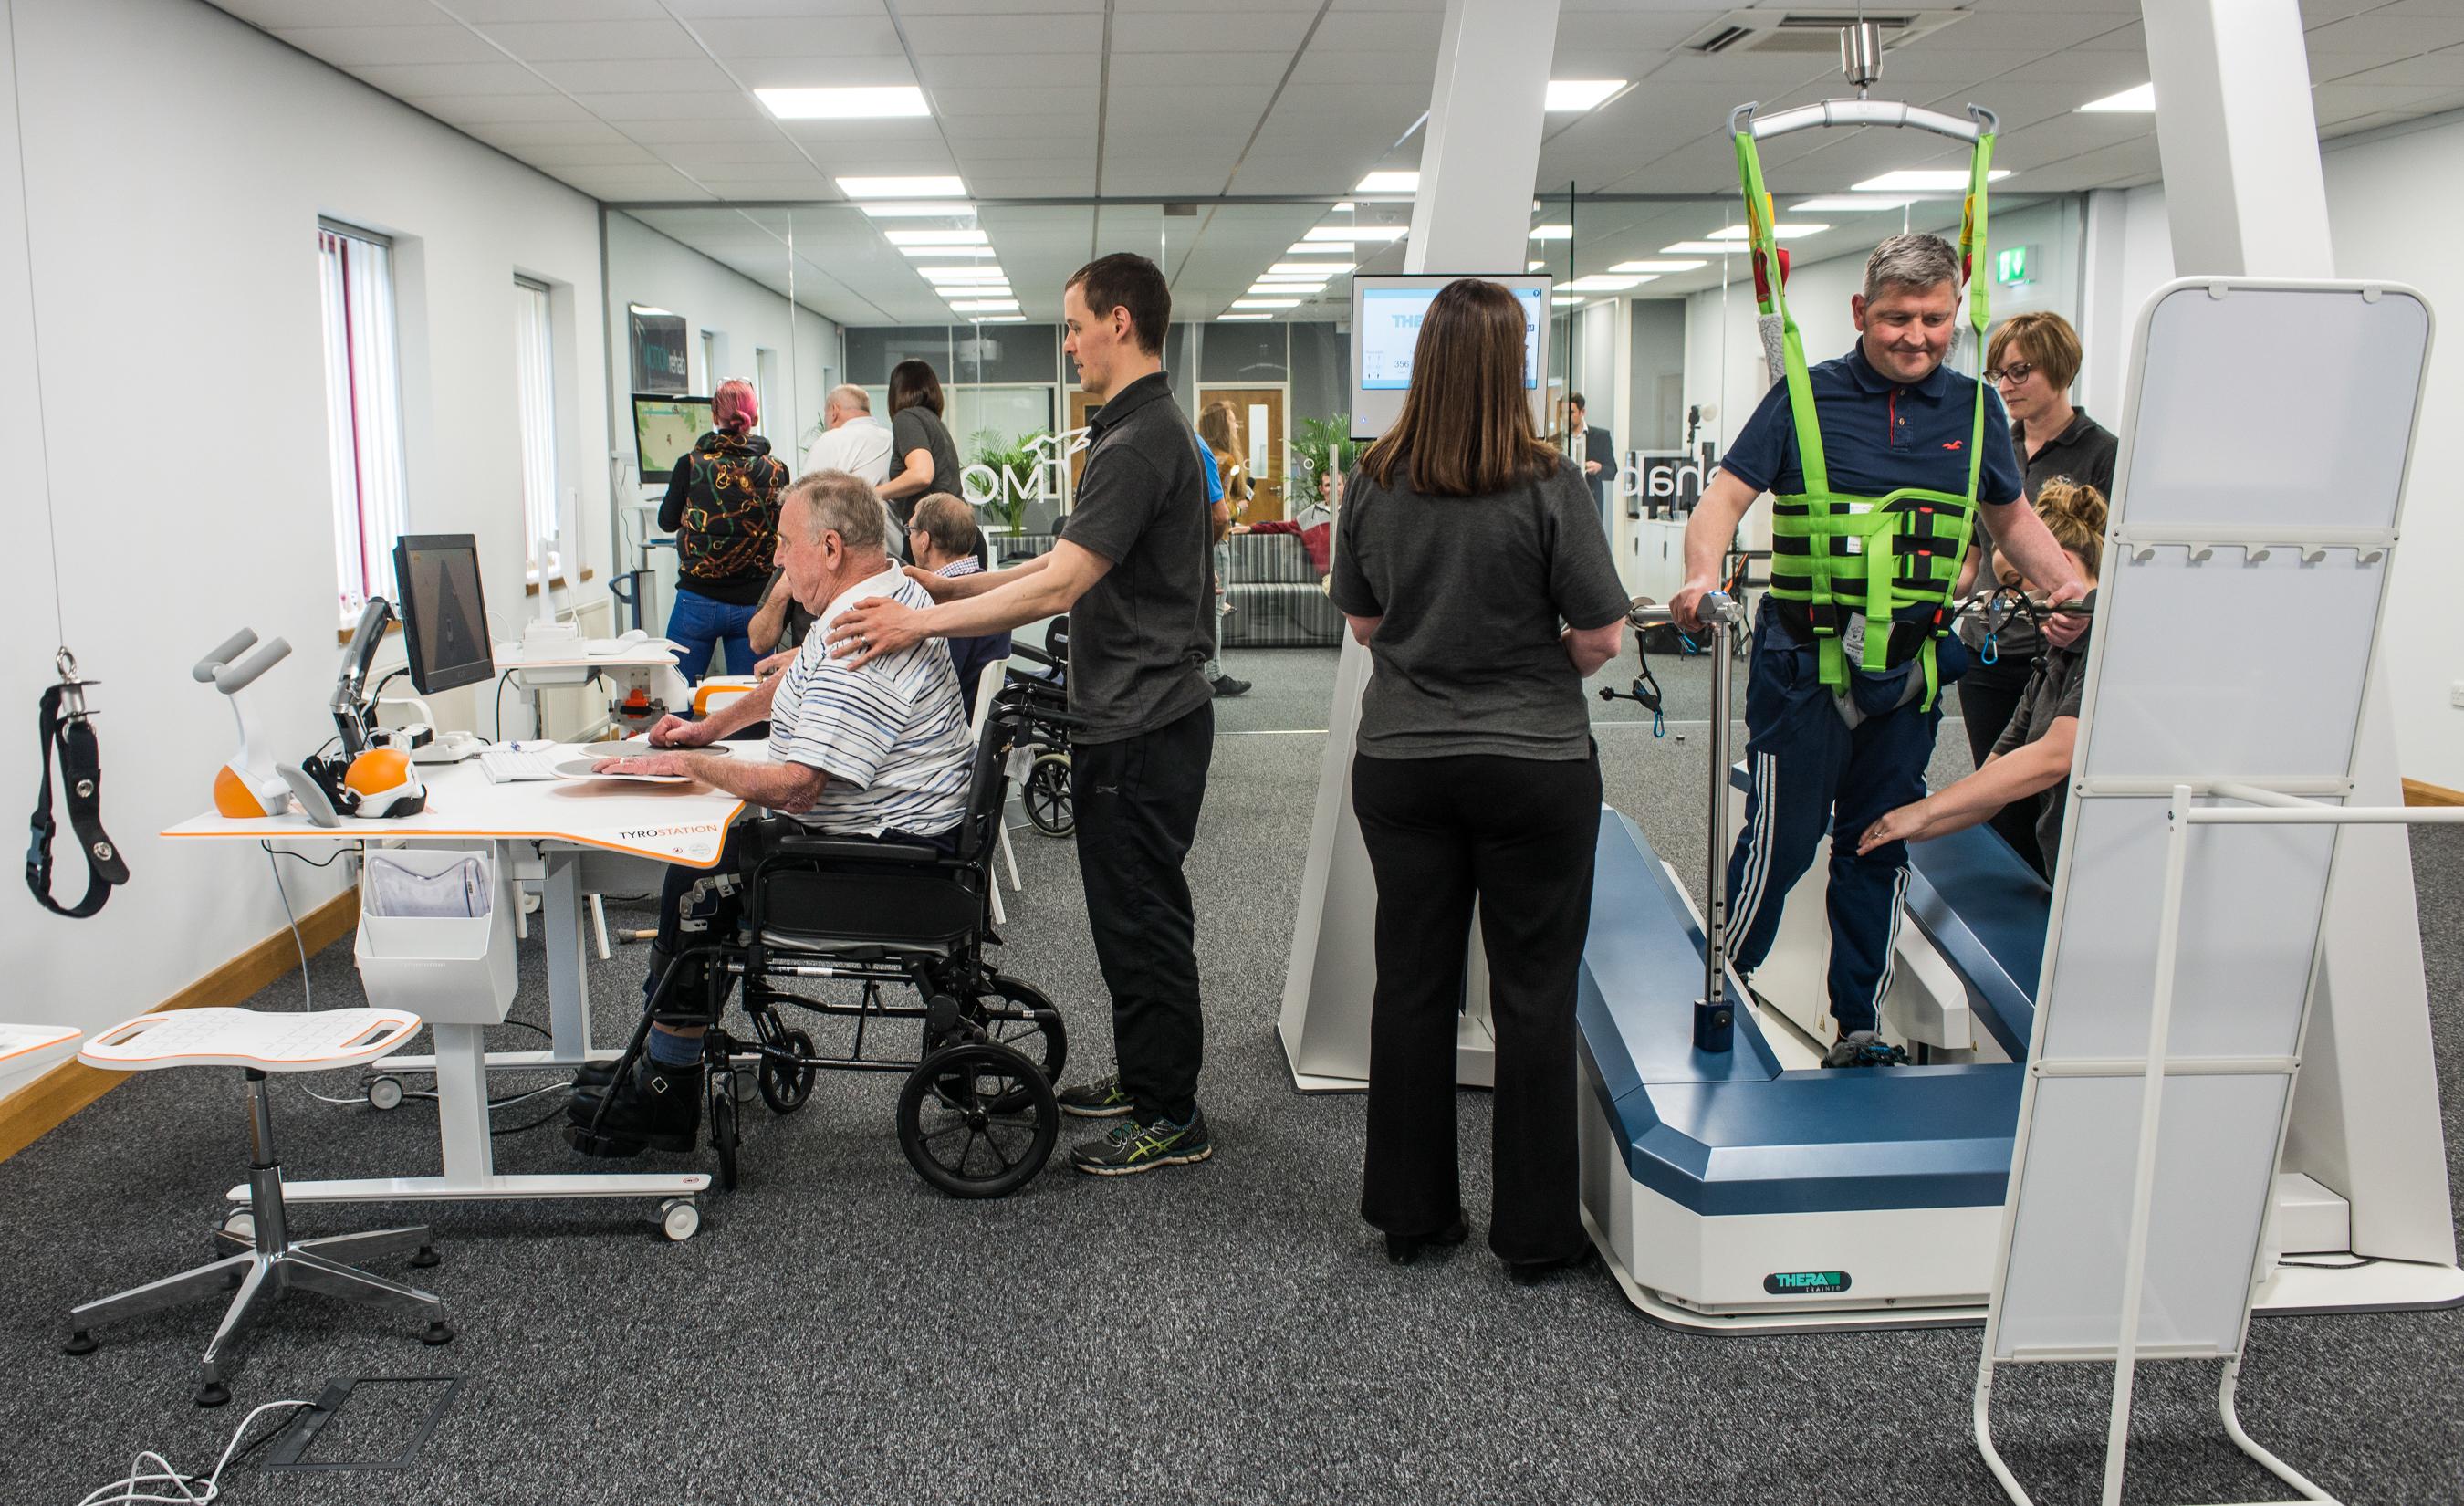 MOTIONrehab's Intensive Rehabilitation Centre in Leeds